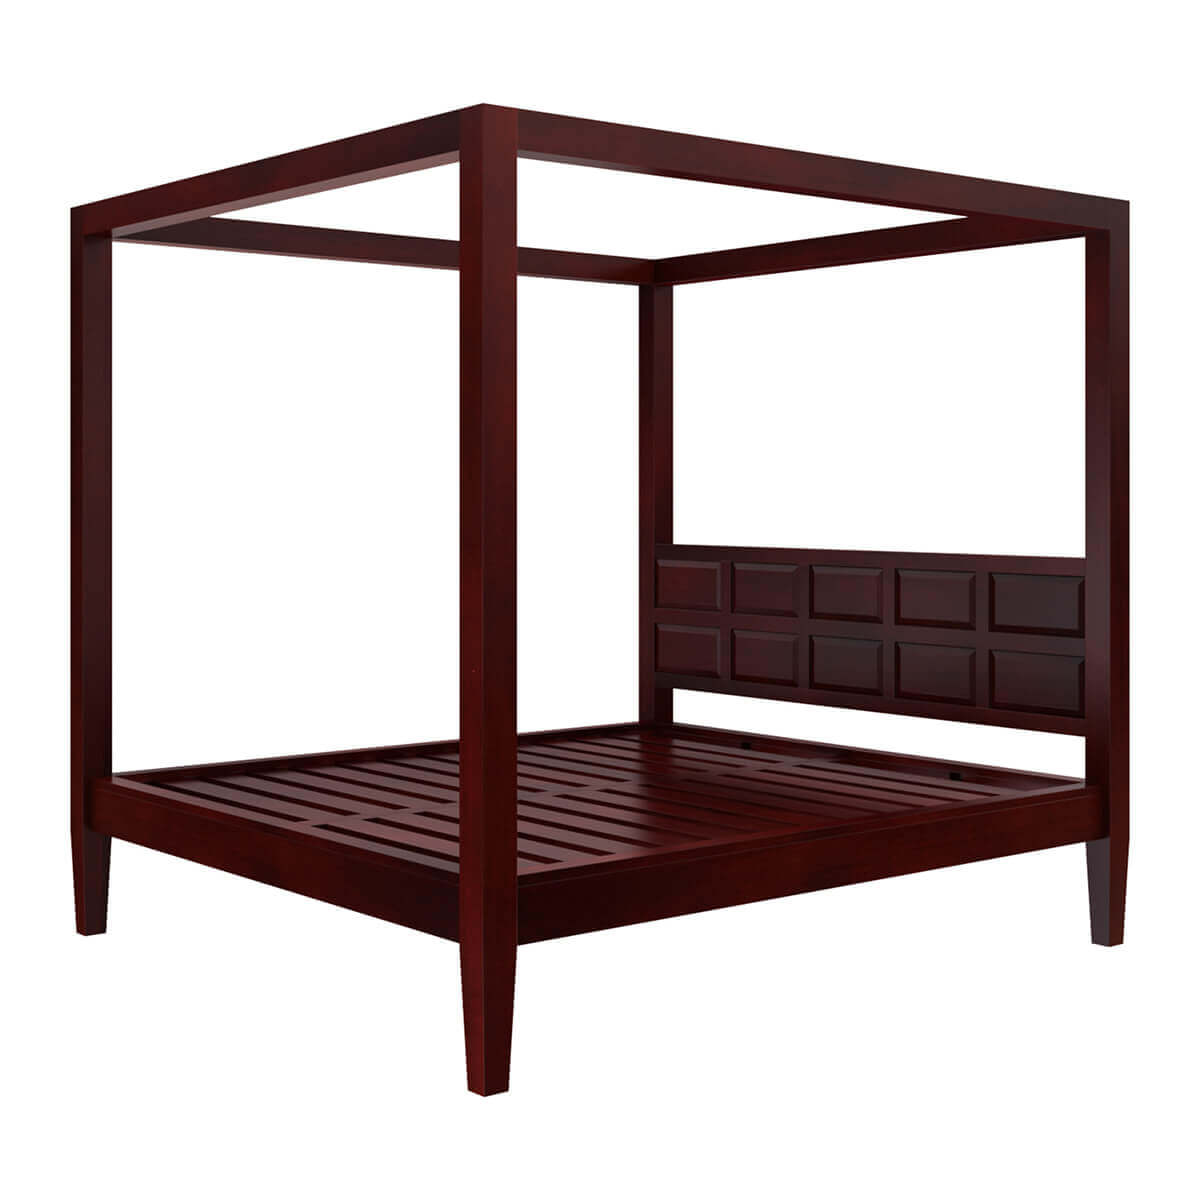 Transitional Bedroom Sets: Henderson Transitional 3 Piece Bedroom Set